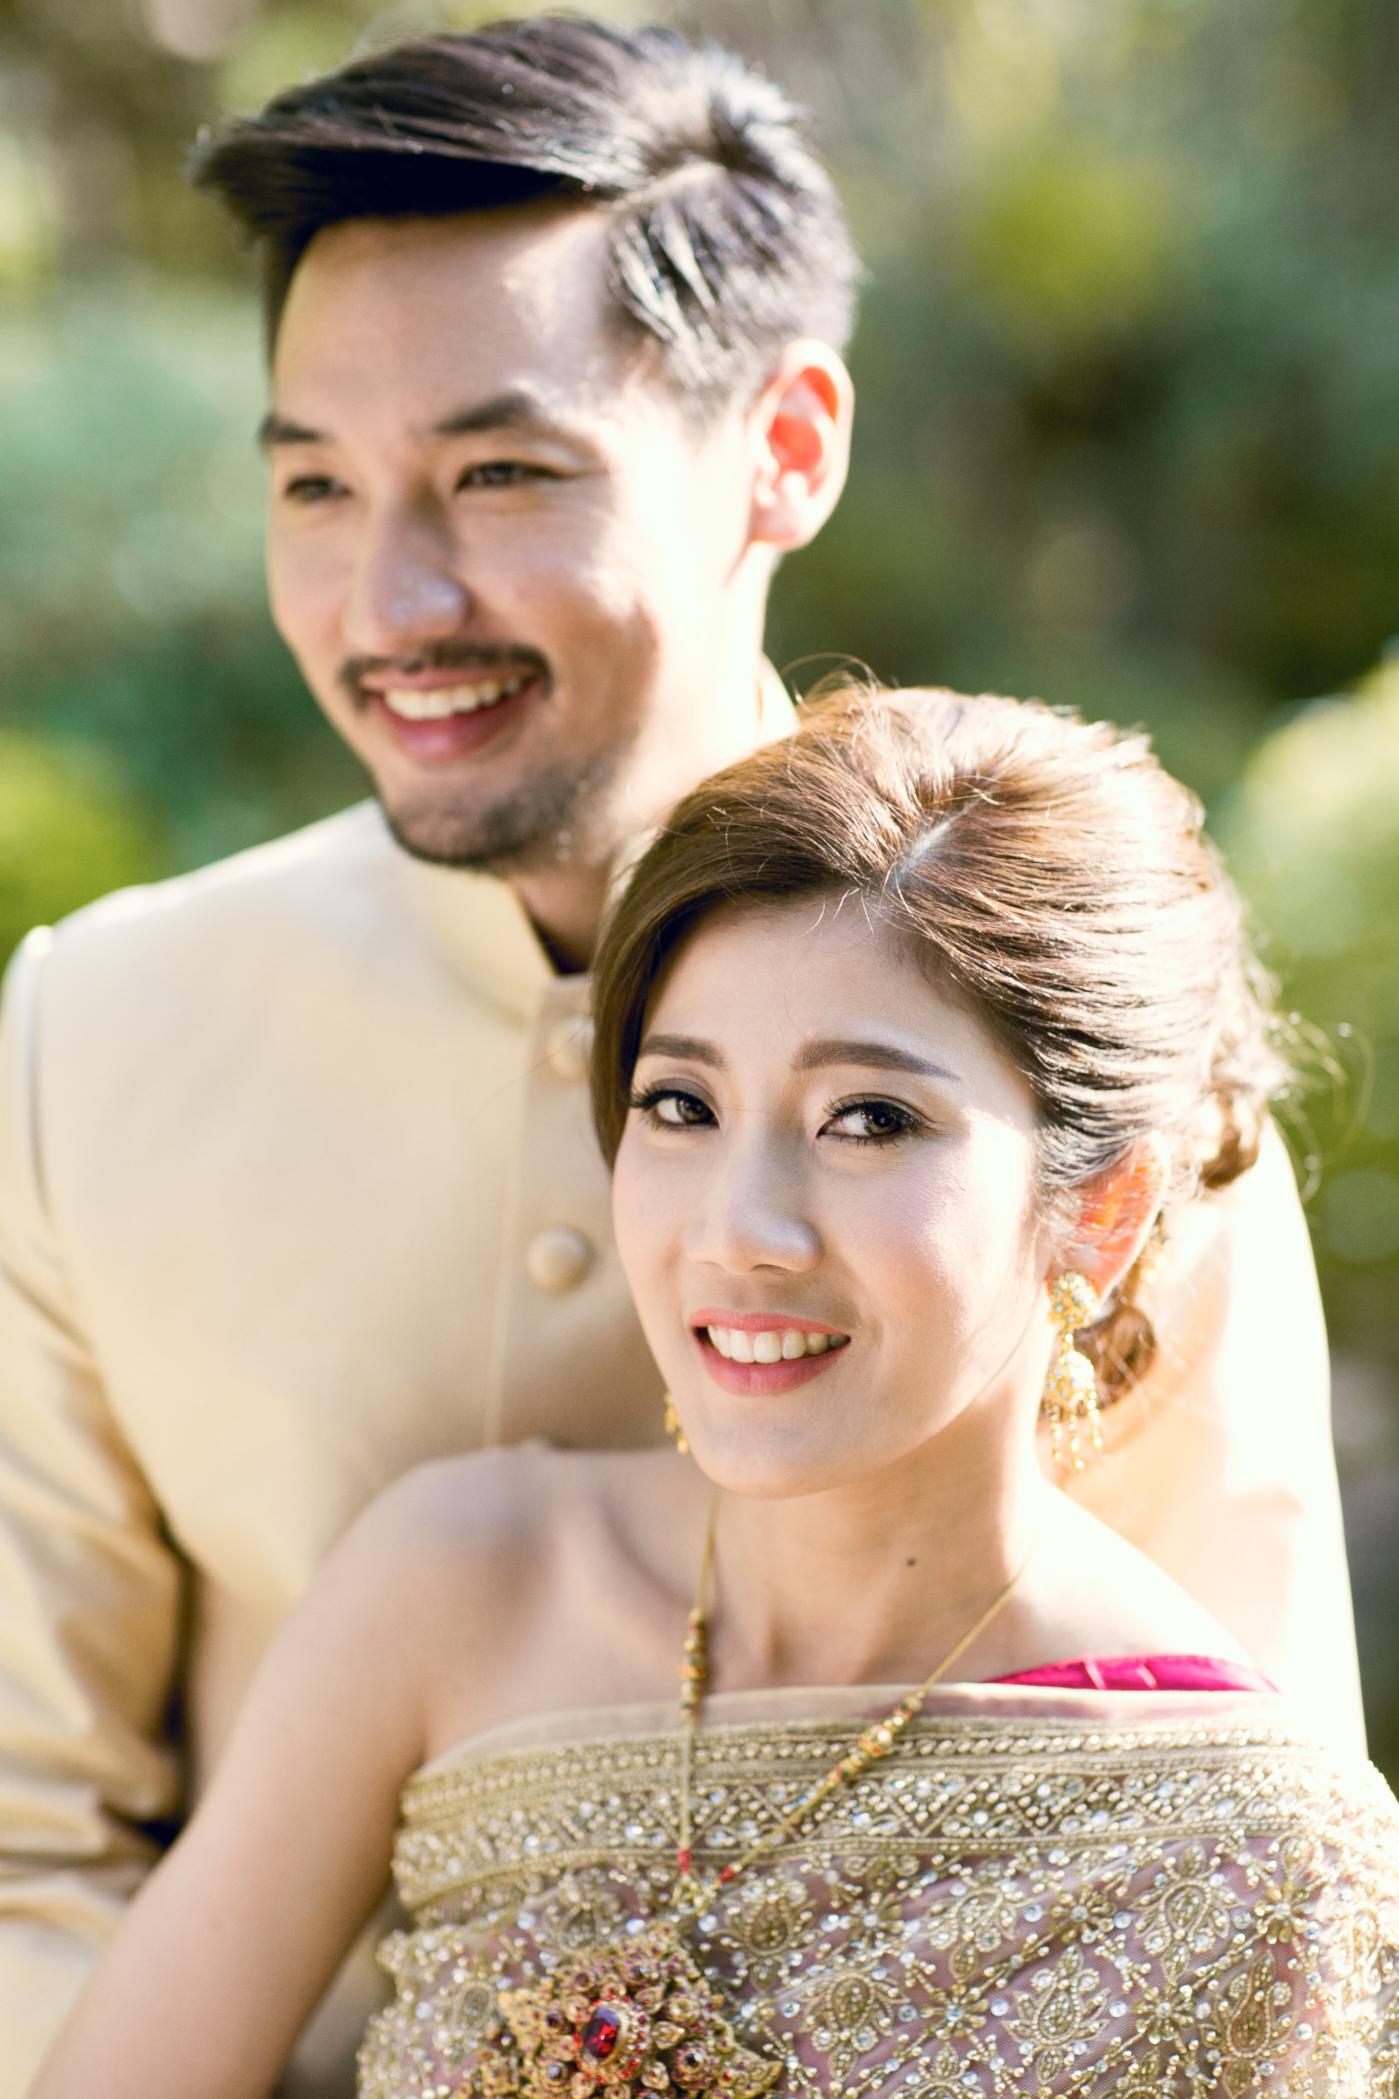 WEDDING 18-3-2017_CAMERA 2_EVENT_103